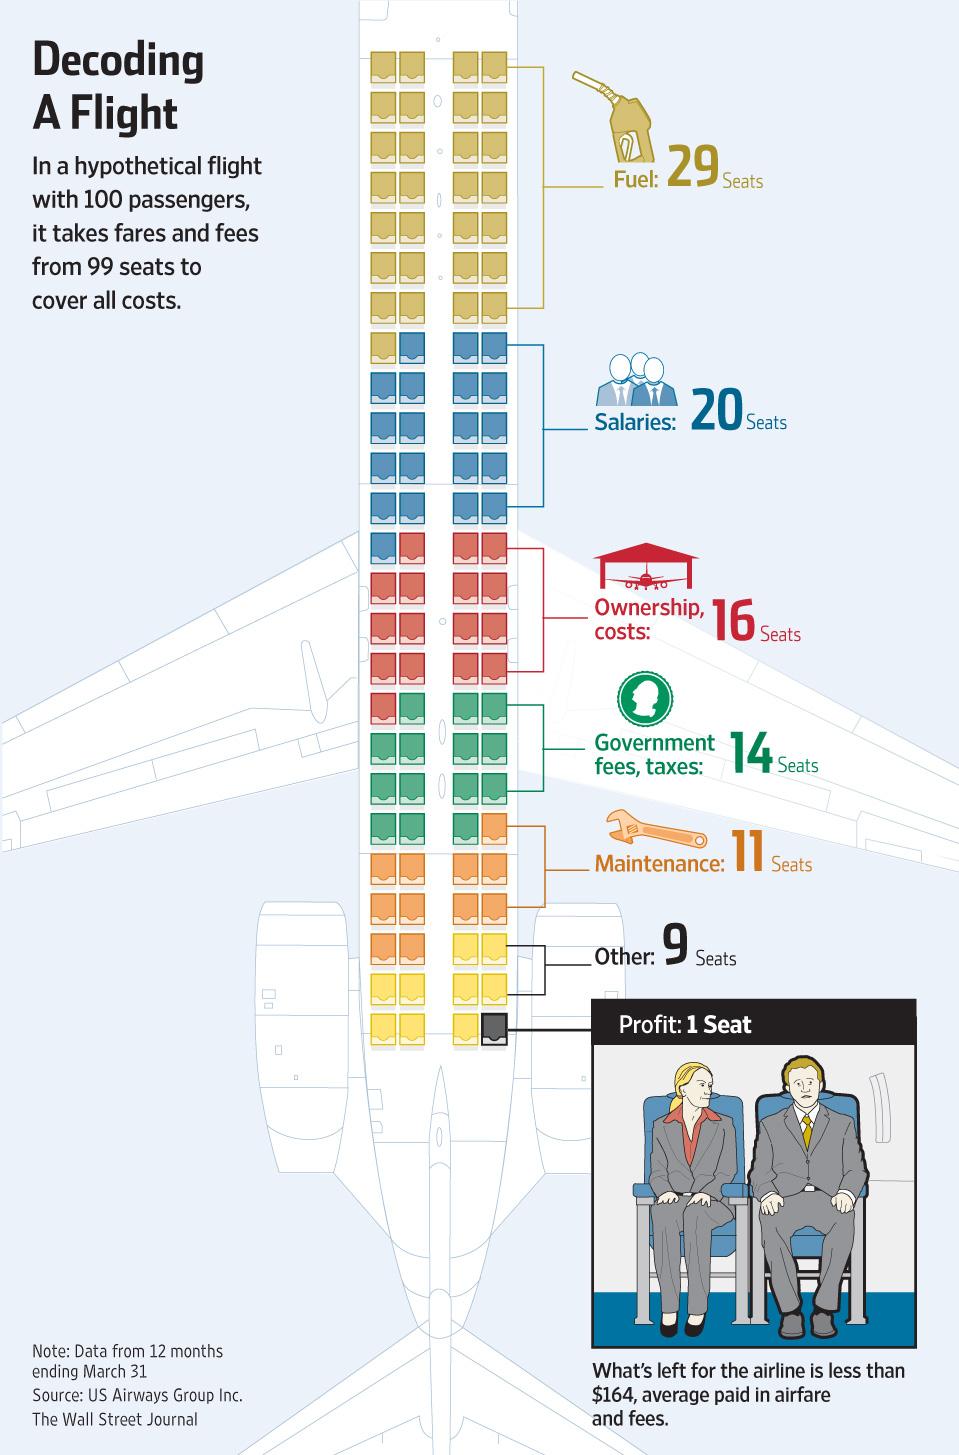 Decoding a Flight